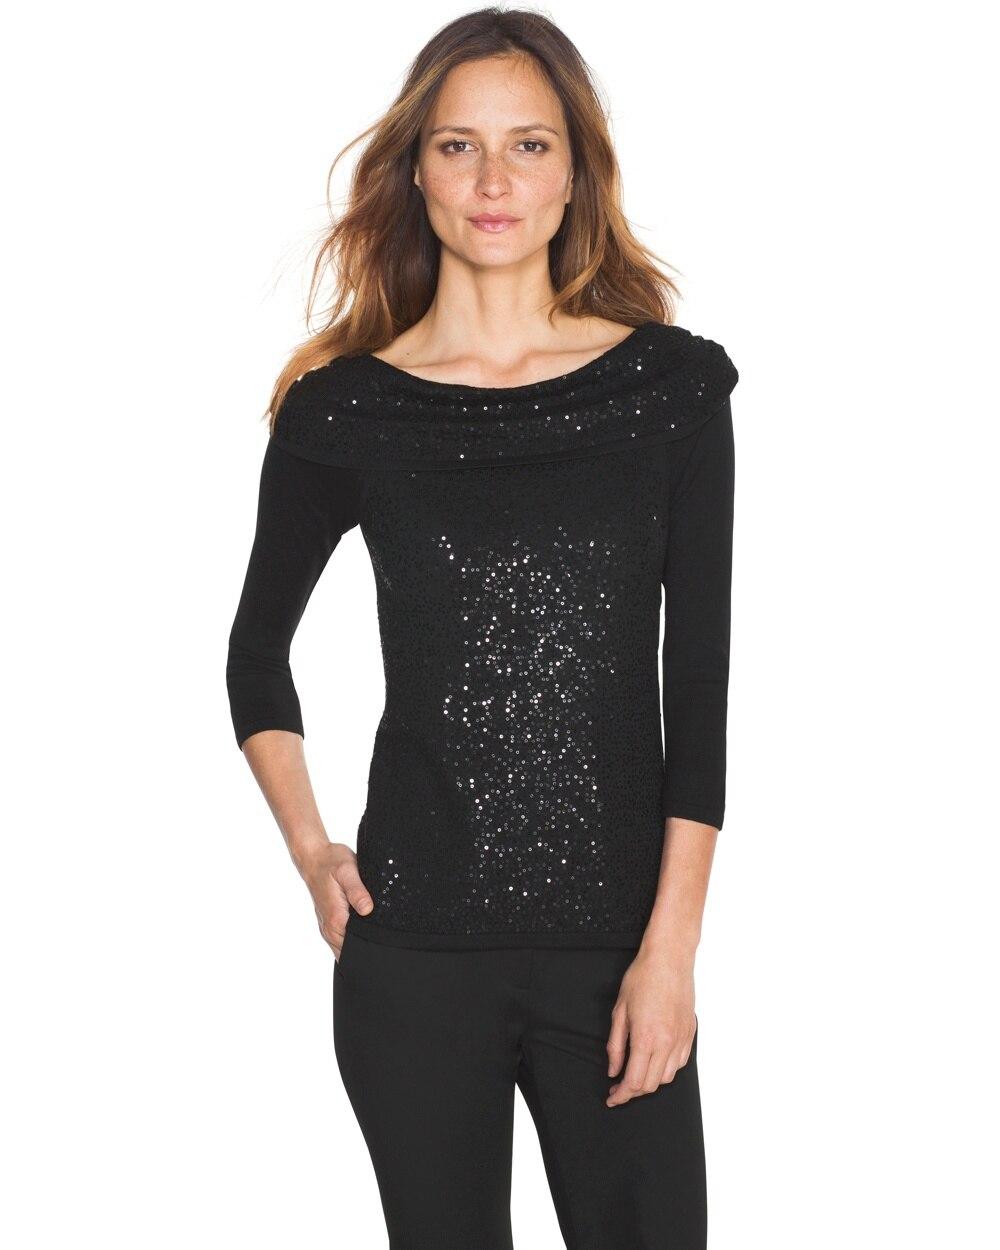 2749b3e6c12 Sequin Pullover - White House Black Market